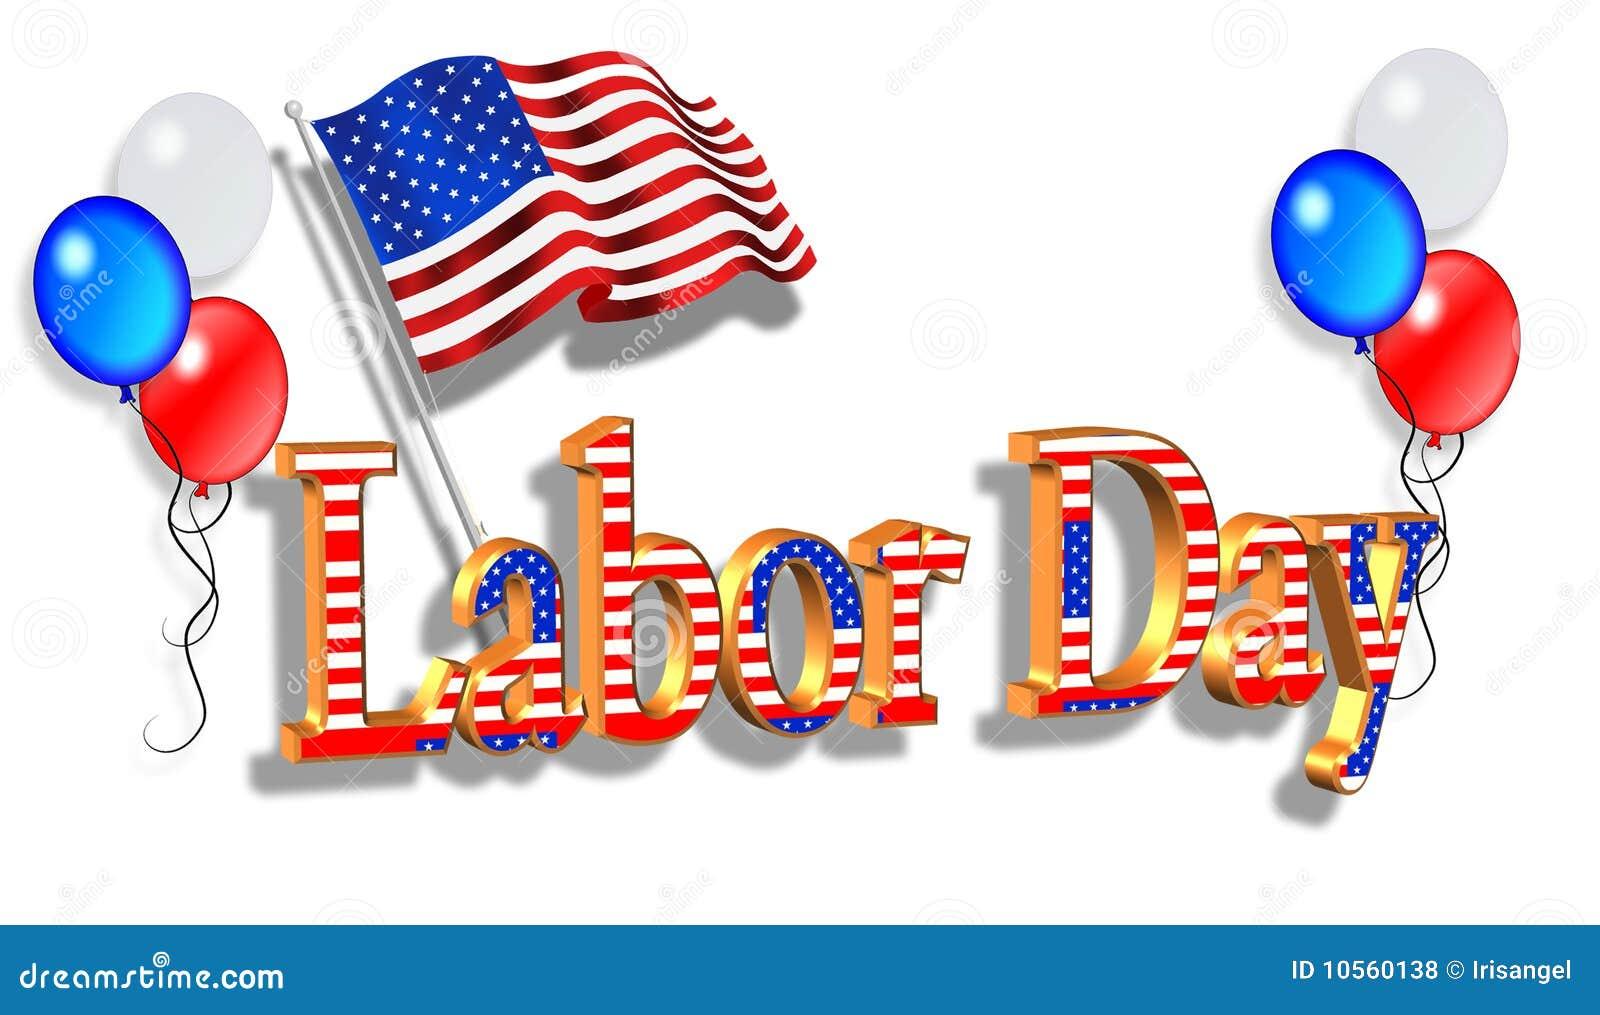 Labor Day Patriotic Border Graphic Royalty Free Stock Photos ...